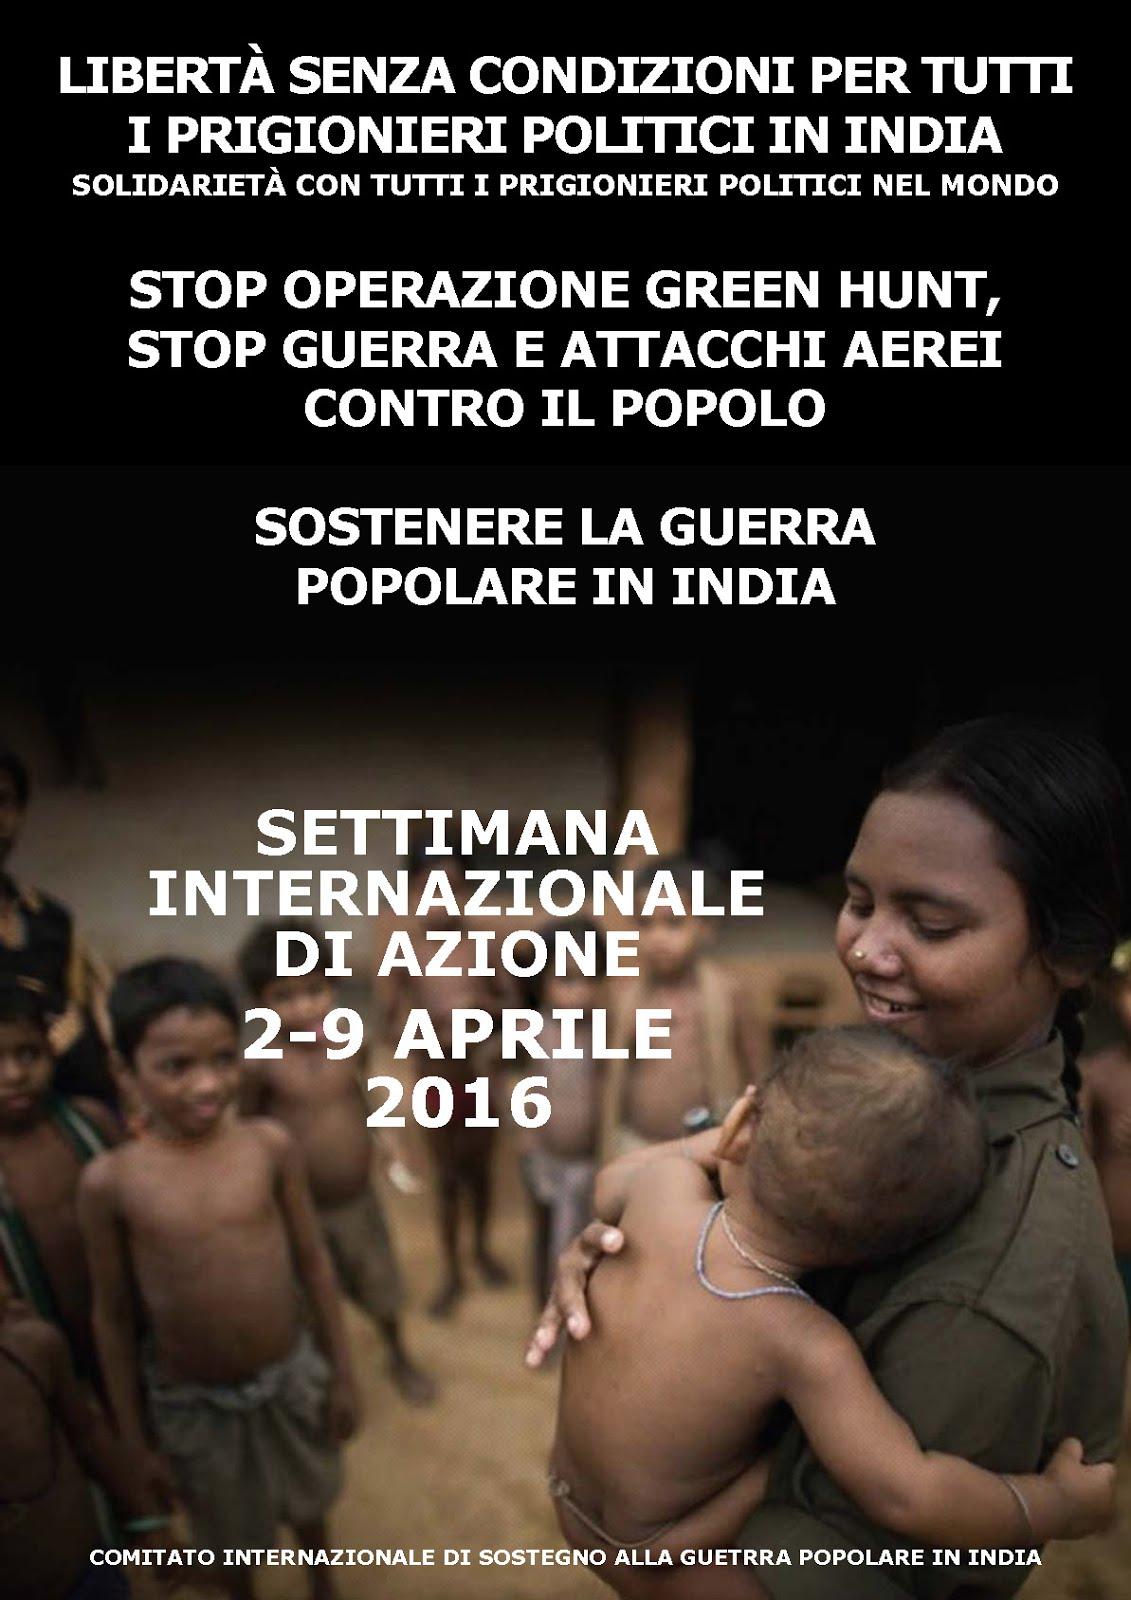 Campagna Internazionale di azione 2-9 aprile 2016